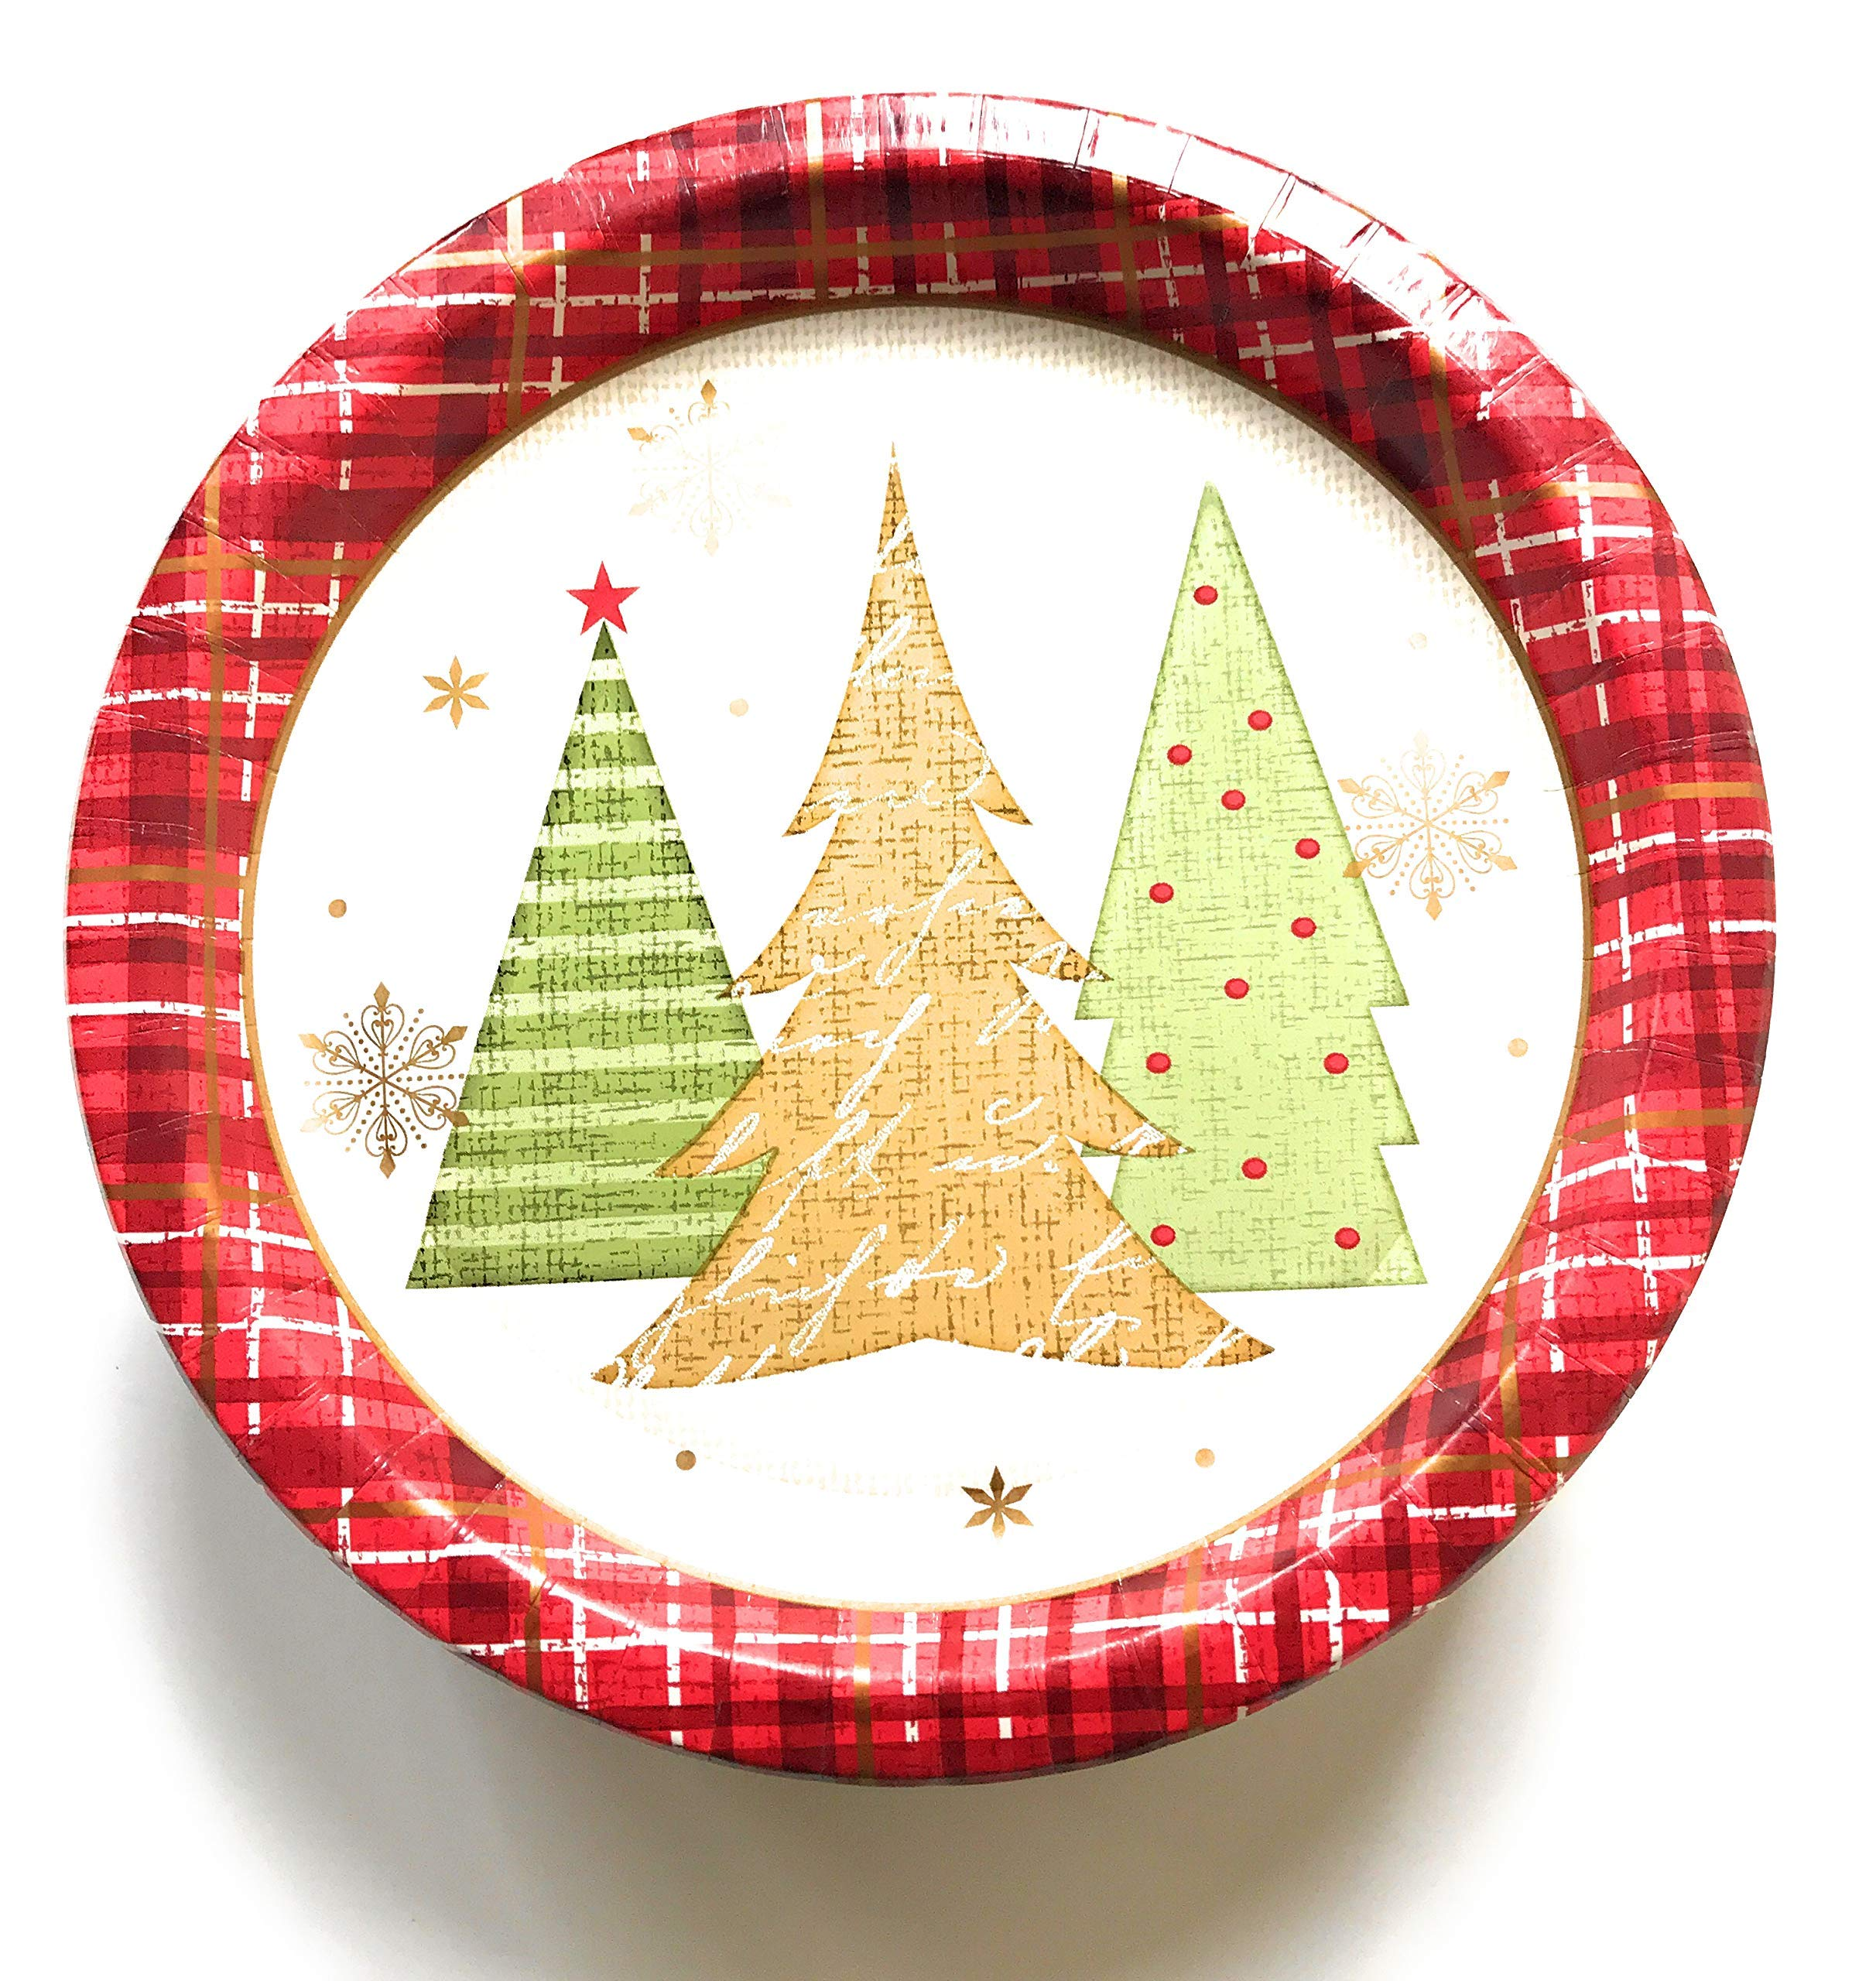 50 Large Christmas Paper Plates - Winter Wonder Theme 10.25 inch Christmas Plates (Large Plates Only)